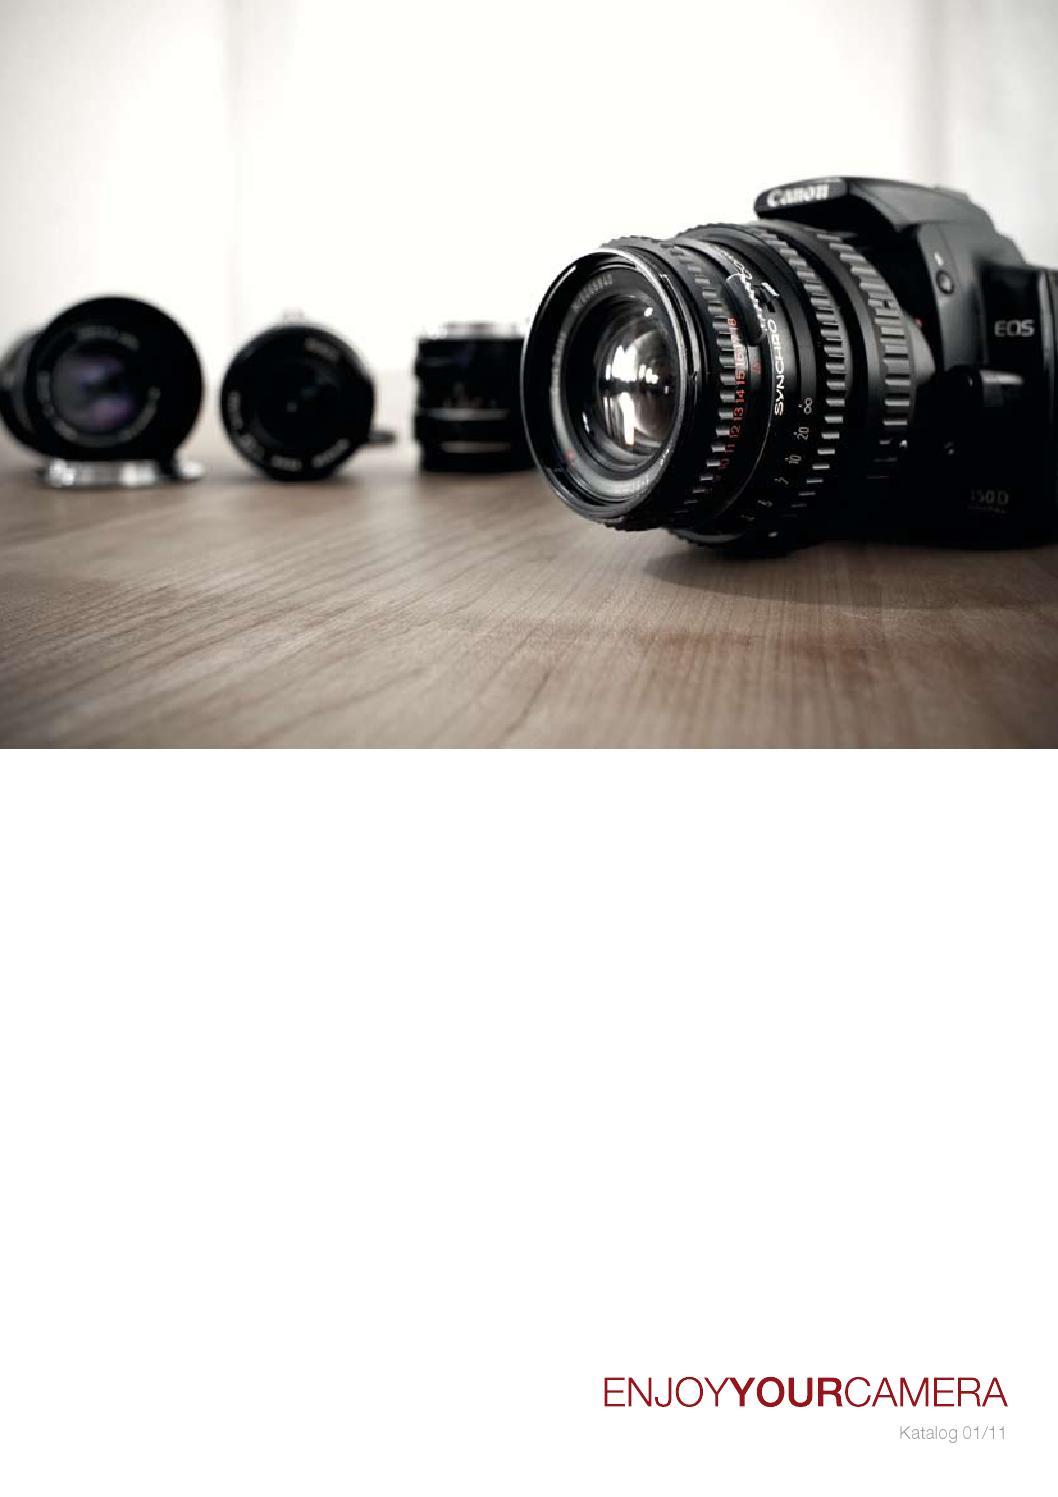 spiral für KONICA MINOLTA Dynax 9,5D Fernauslöser Kamera Anschlusskabel S1